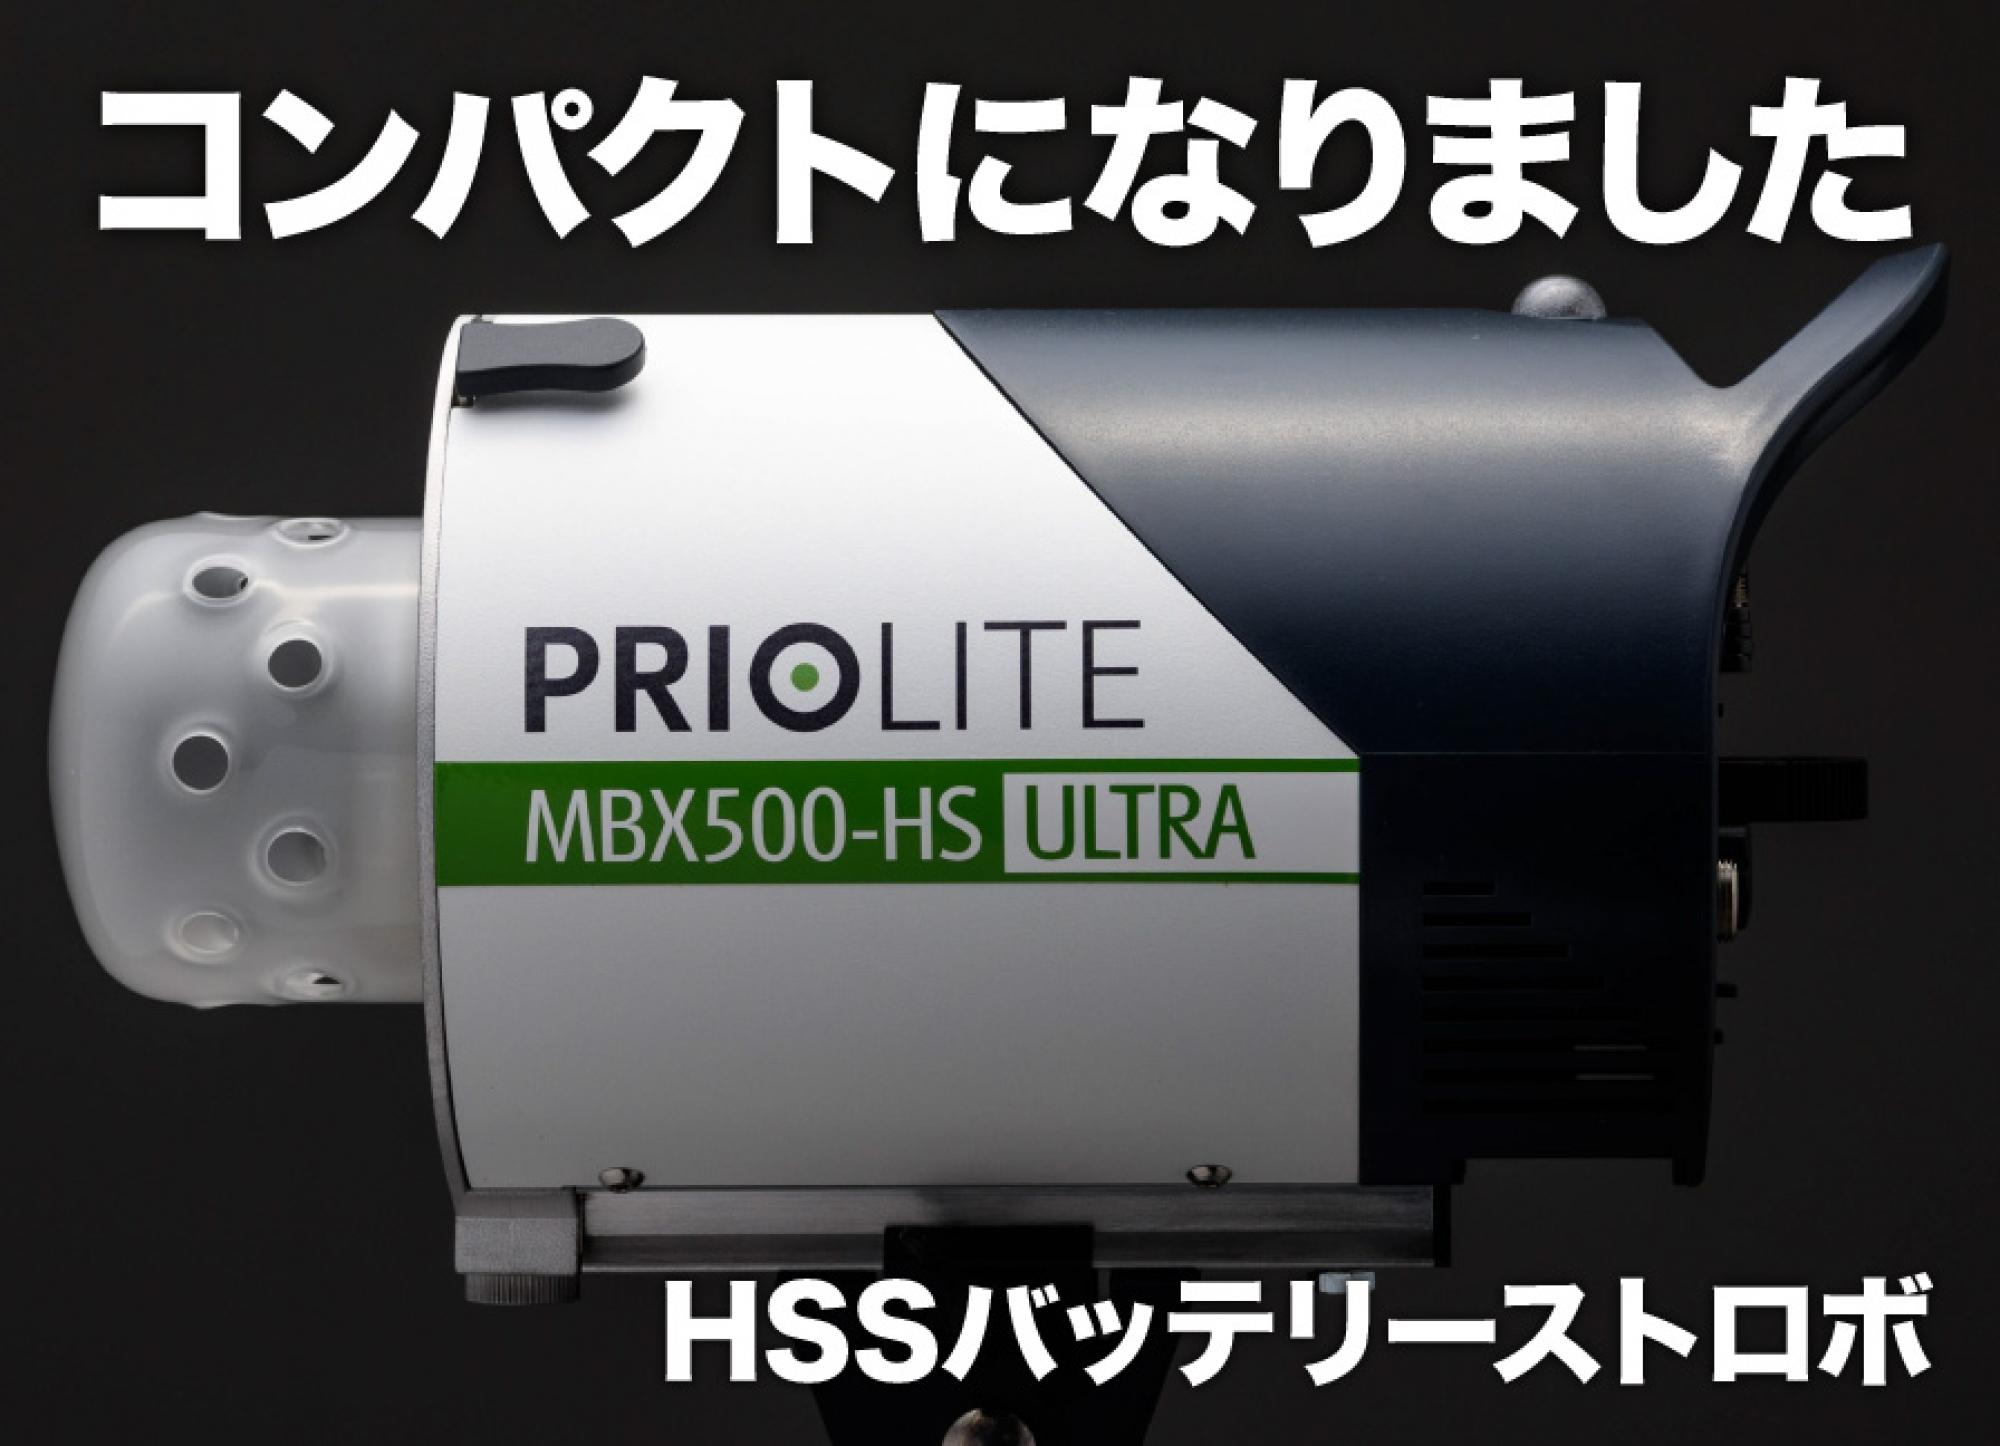 645ZなどPentaxカメラにも対応するハイスピードシンクロ バッテリーストロボ